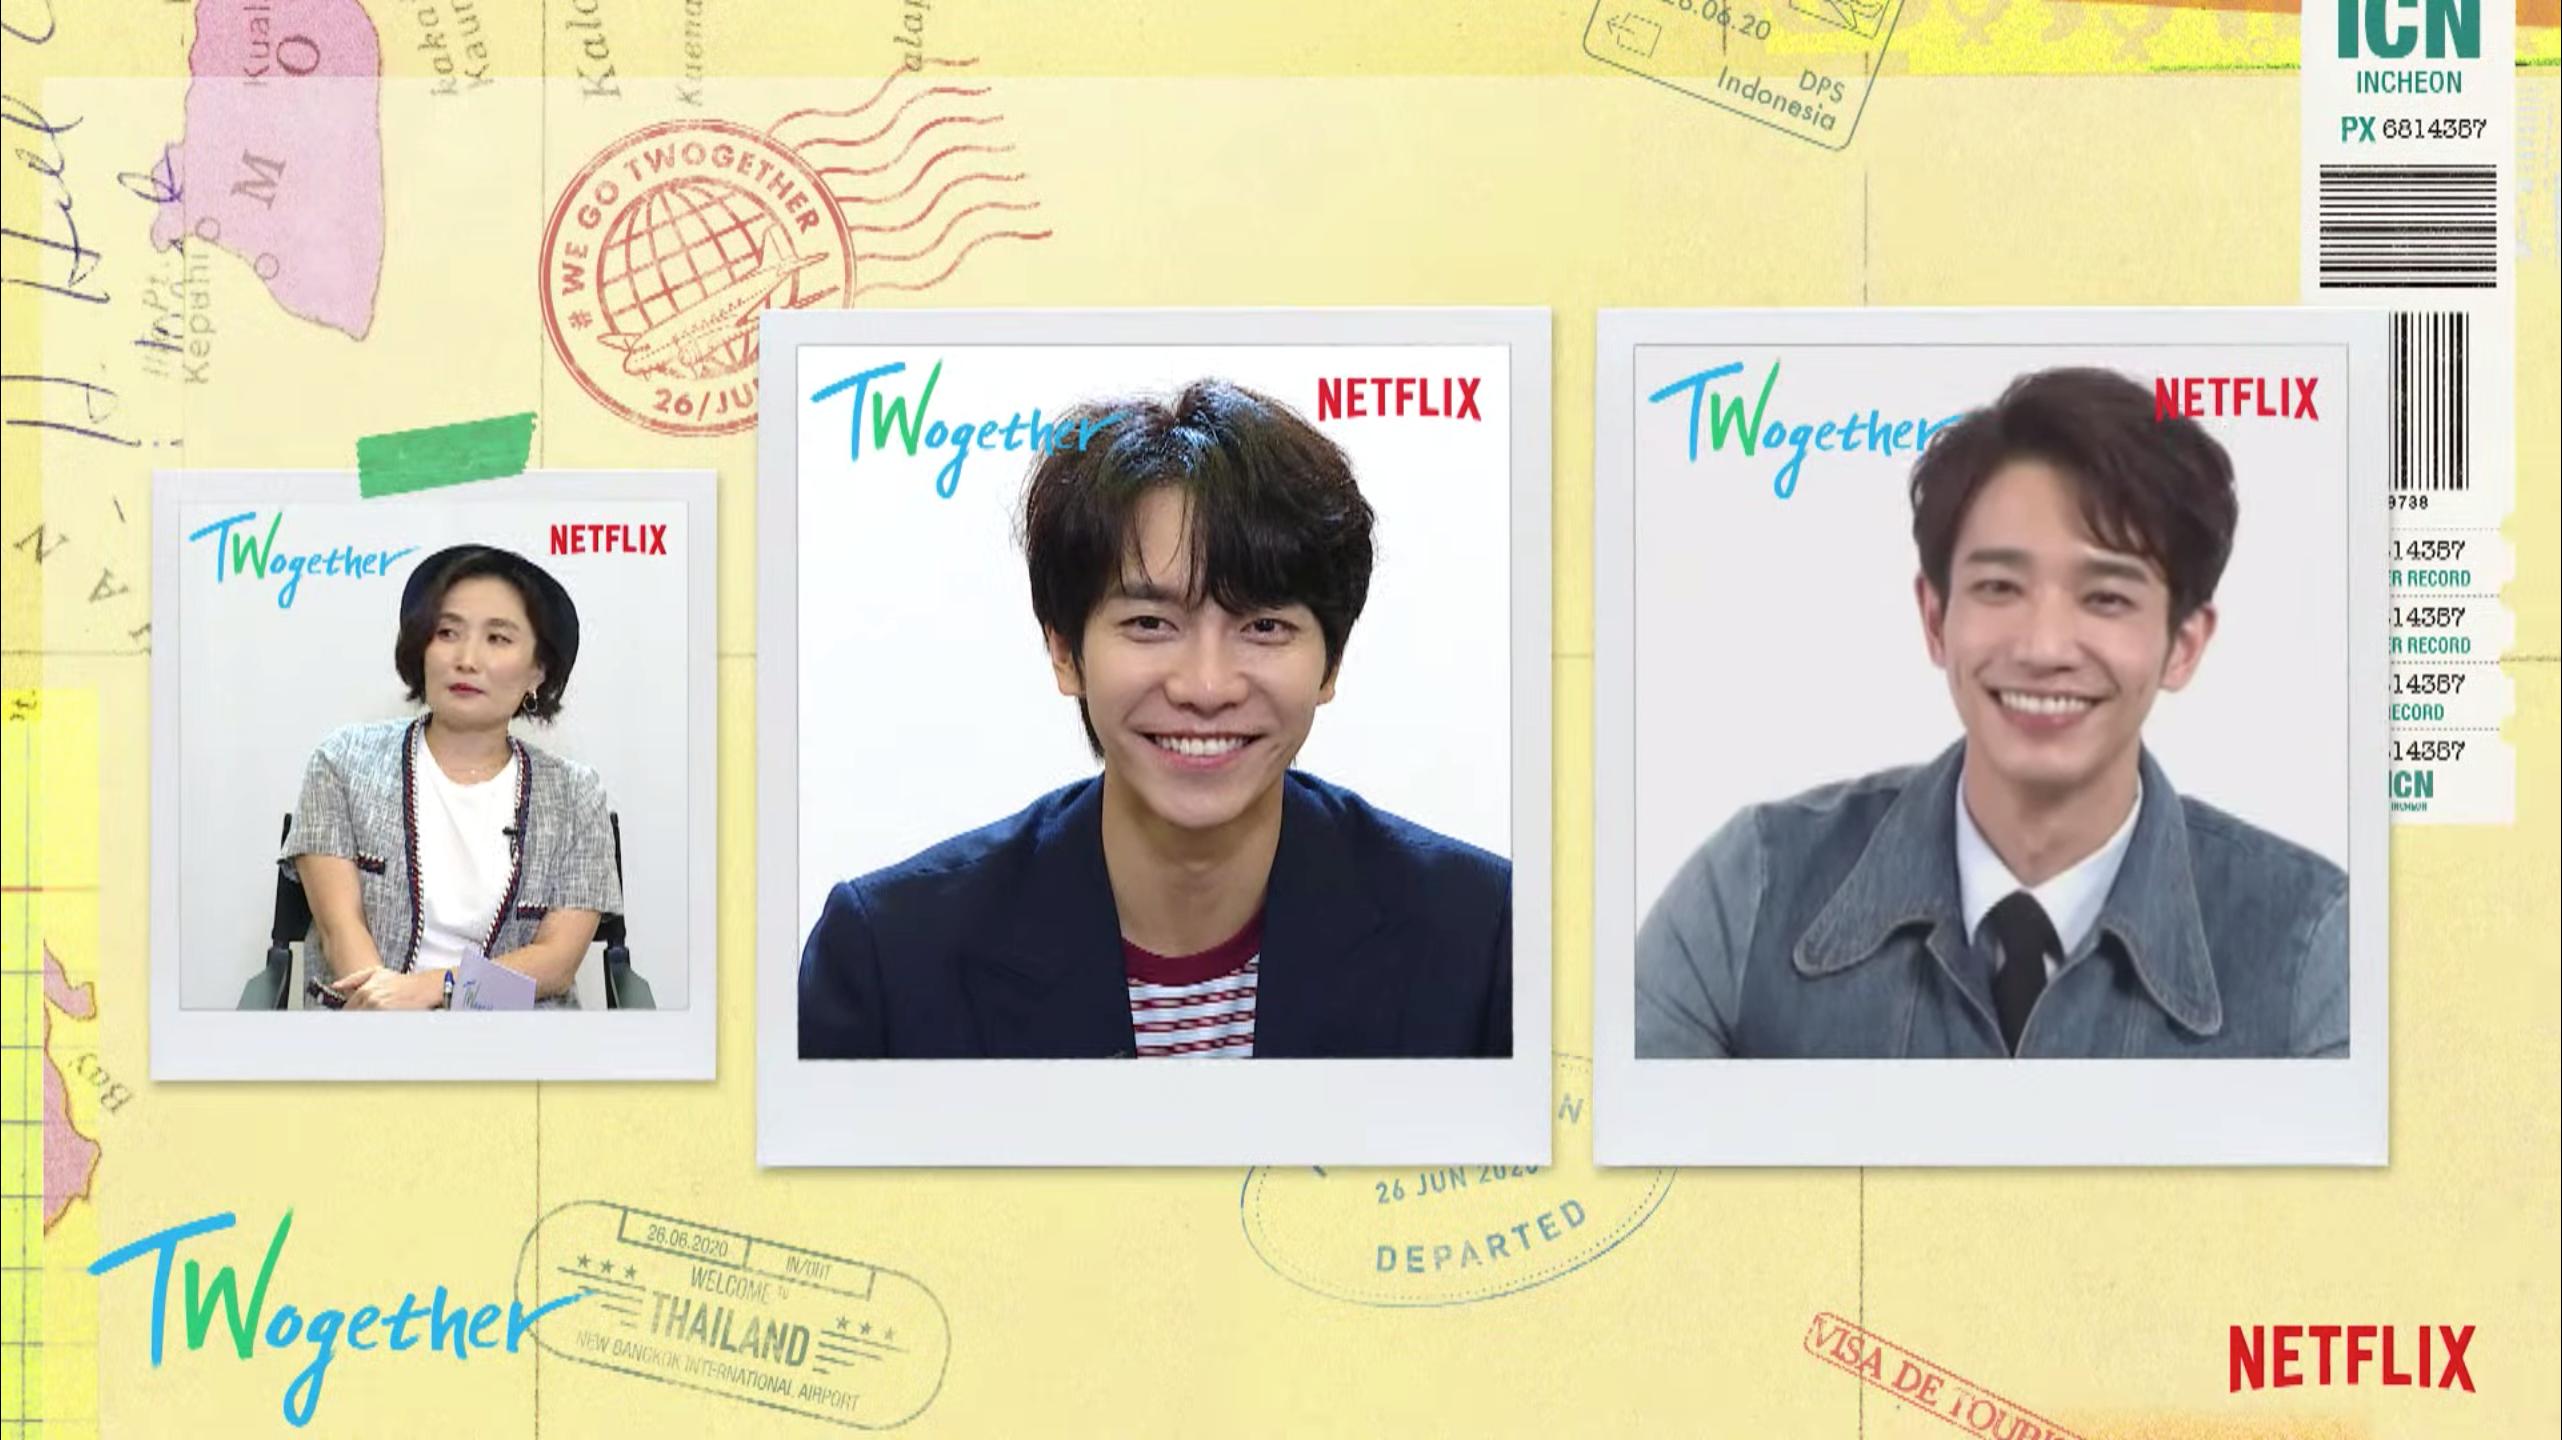 Jasper and Seunggi have similar smiles!